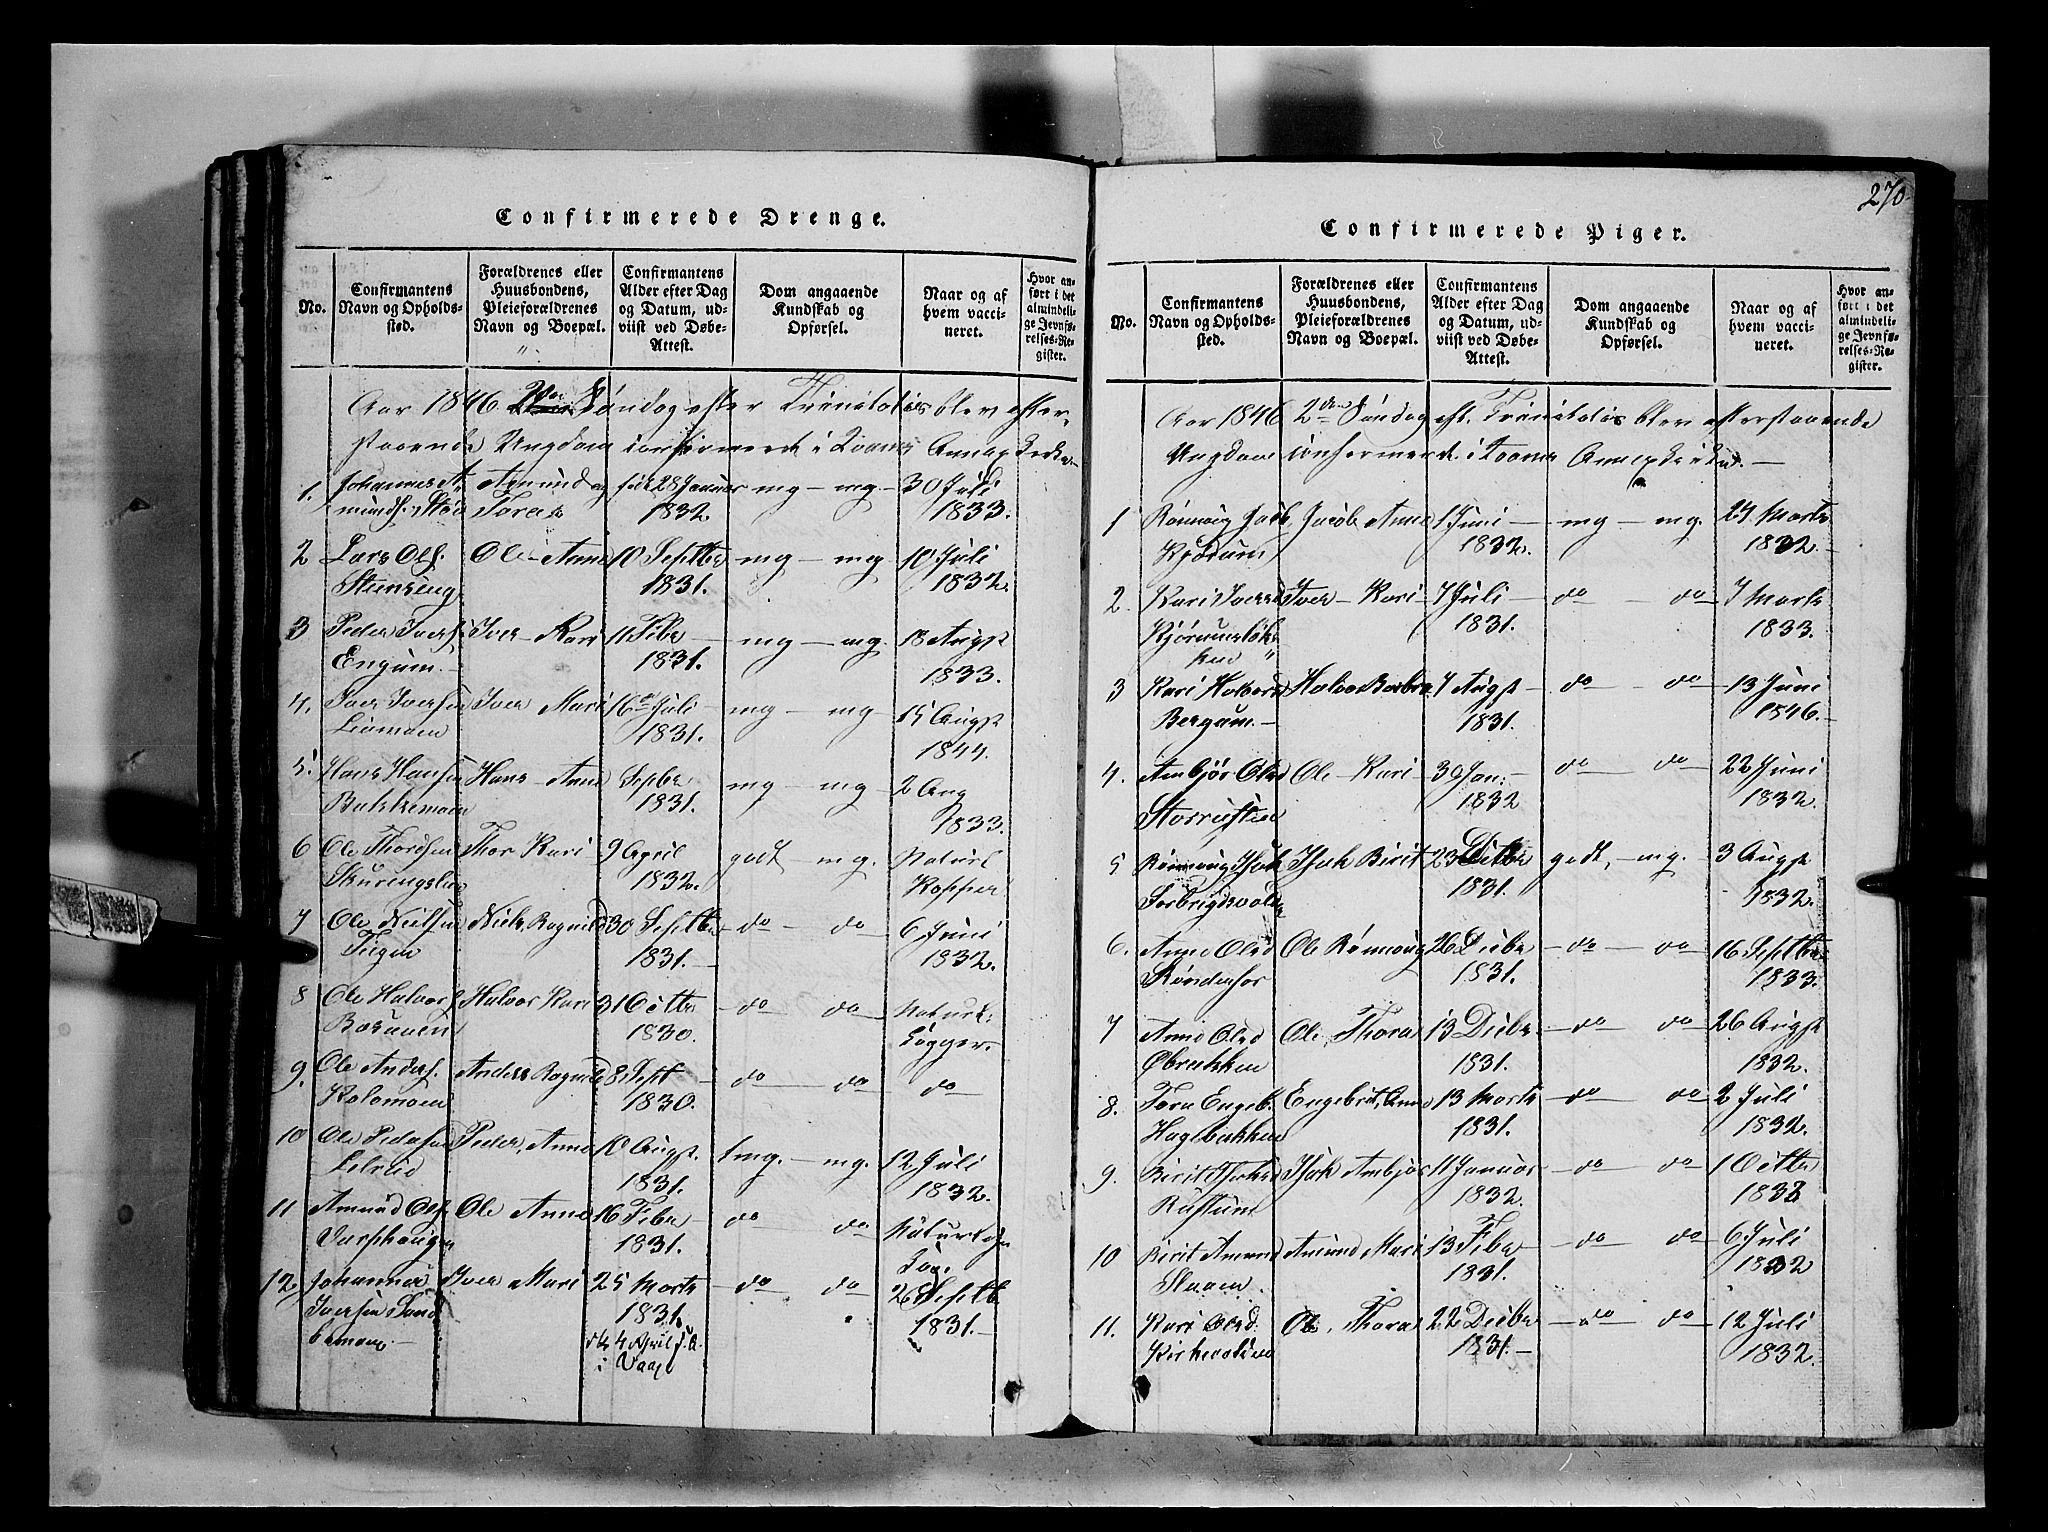 SAH, Fron prestekontor, H/Ha/Hab/L0002: Klokkerbok nr. 2, 1816-1850, s. 270